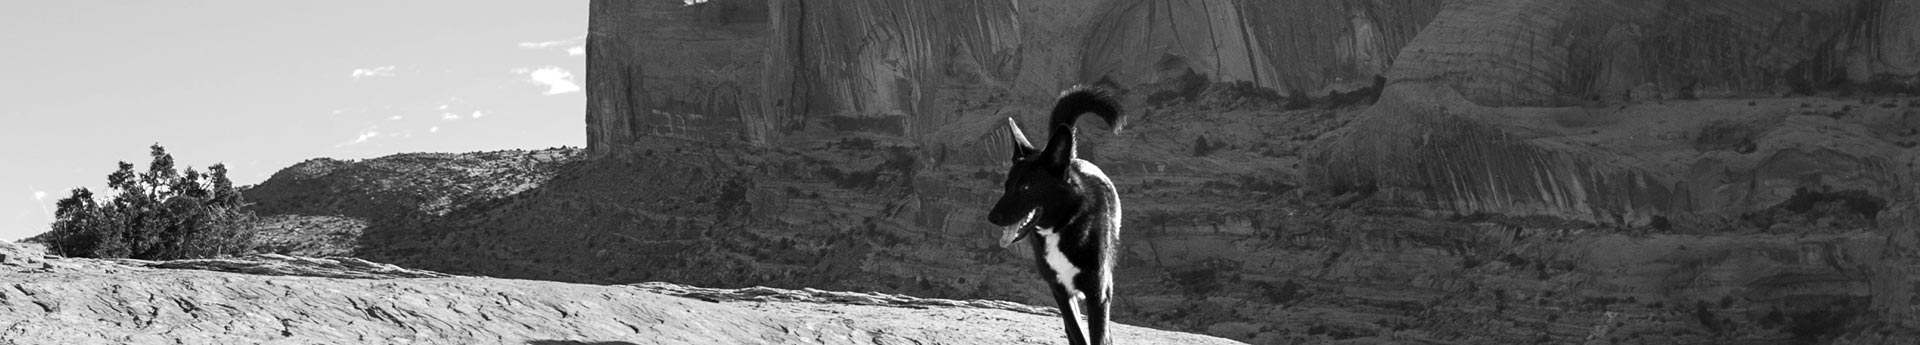 ORIJEN Puppy Large Dog Food - Black dog in the Moab desert - Fearless Iro in Moab, Utah